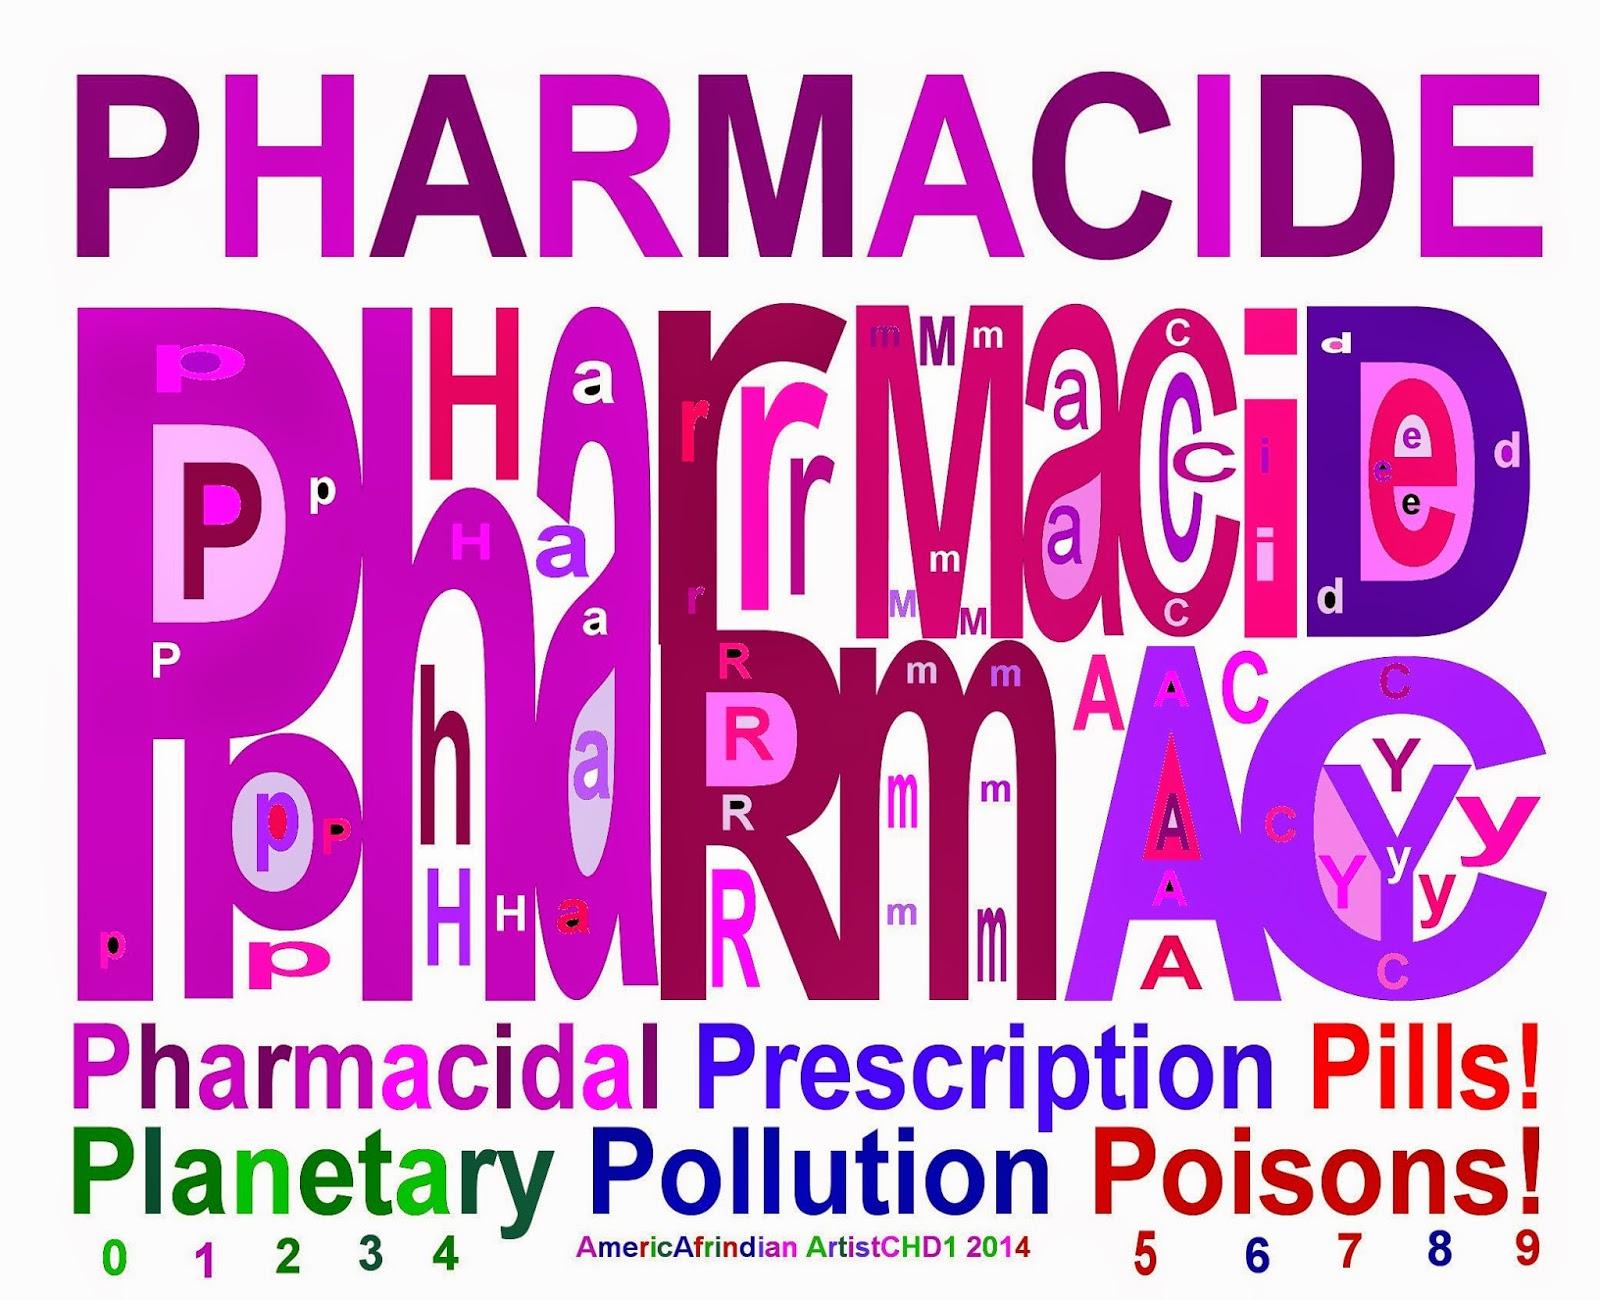 PHARMACIDE - Pharmaceutical Prescription Pill Poisons-Pollution!!